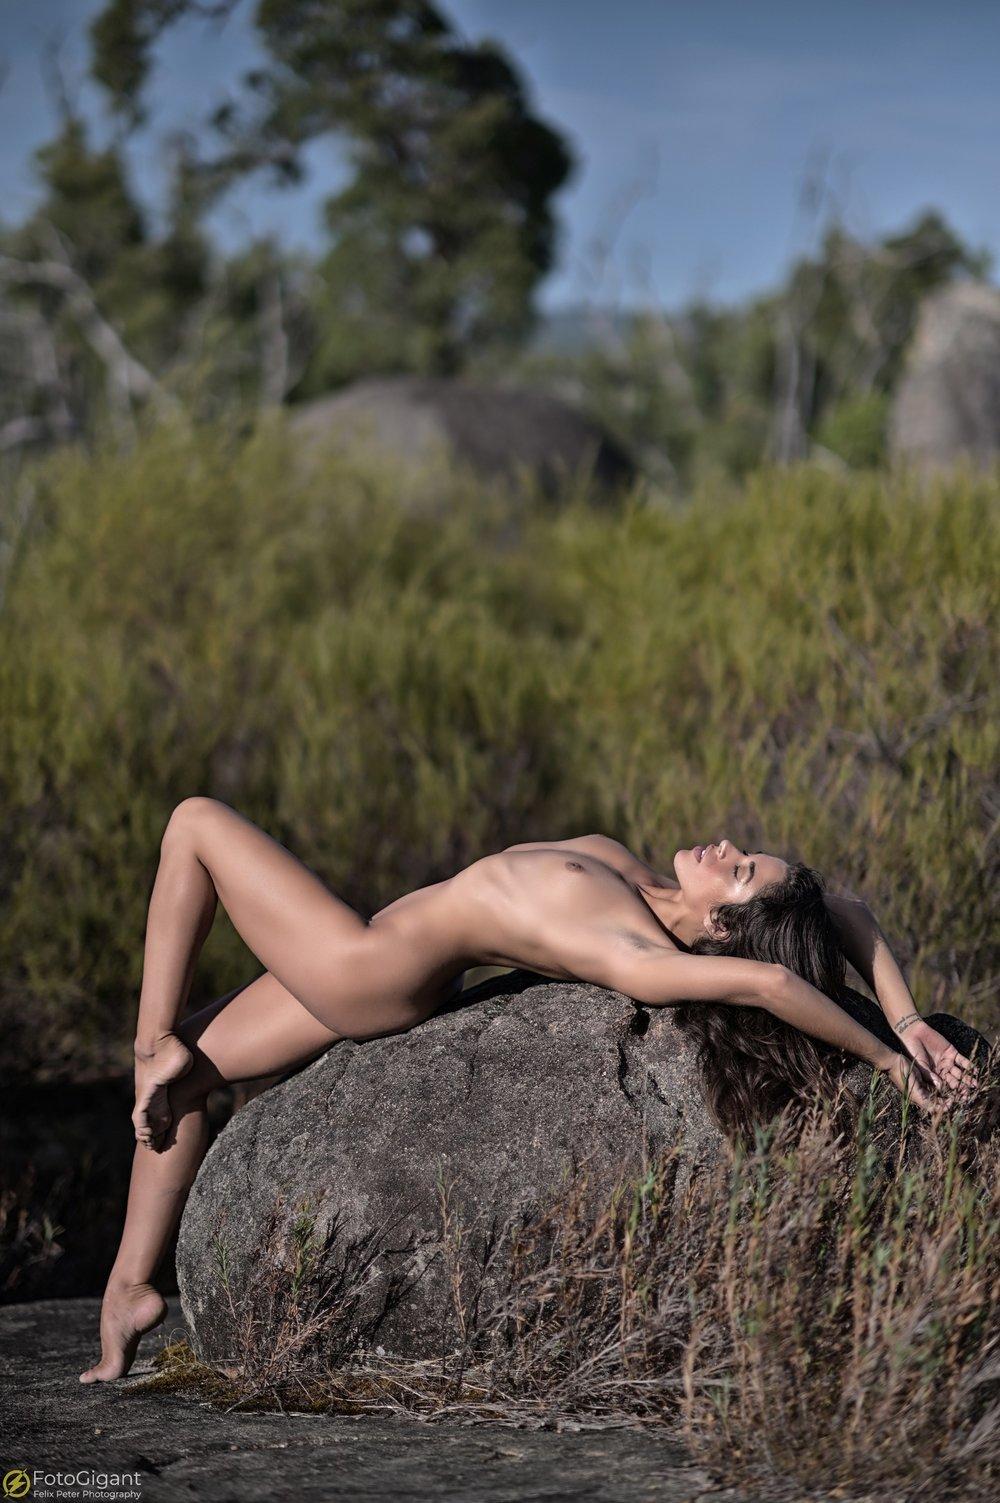 NudeArt_Aktfotografie_Eva-Luna_13.jpg